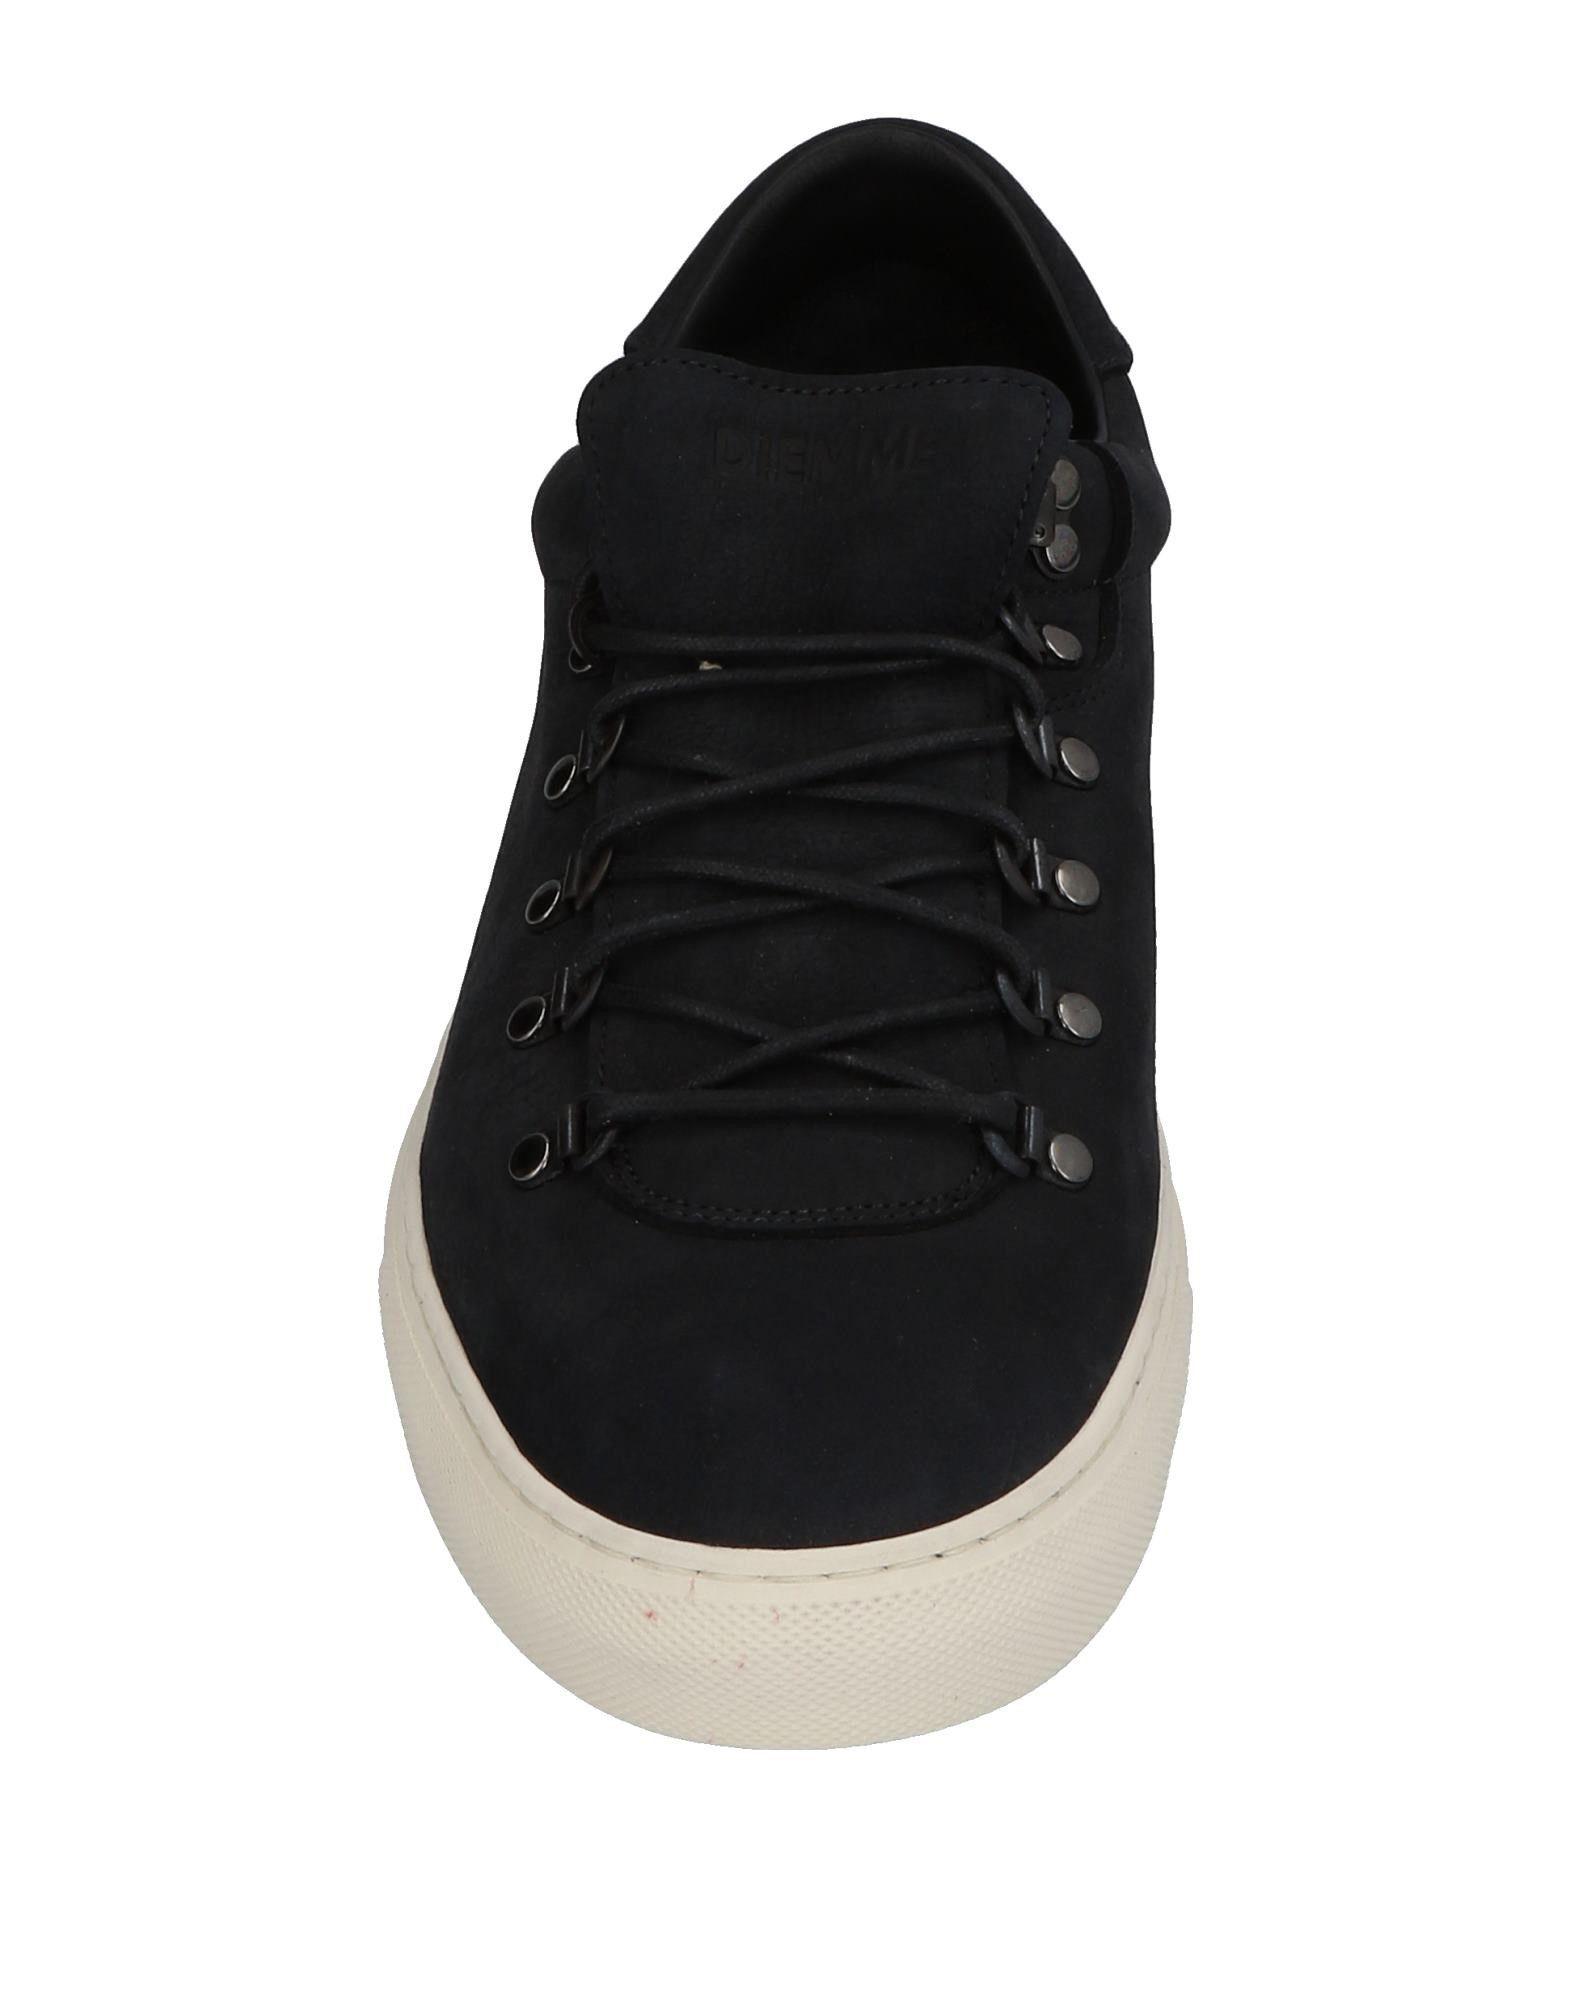 Sneakers Diemme Femme - Sneakers Diemme sur